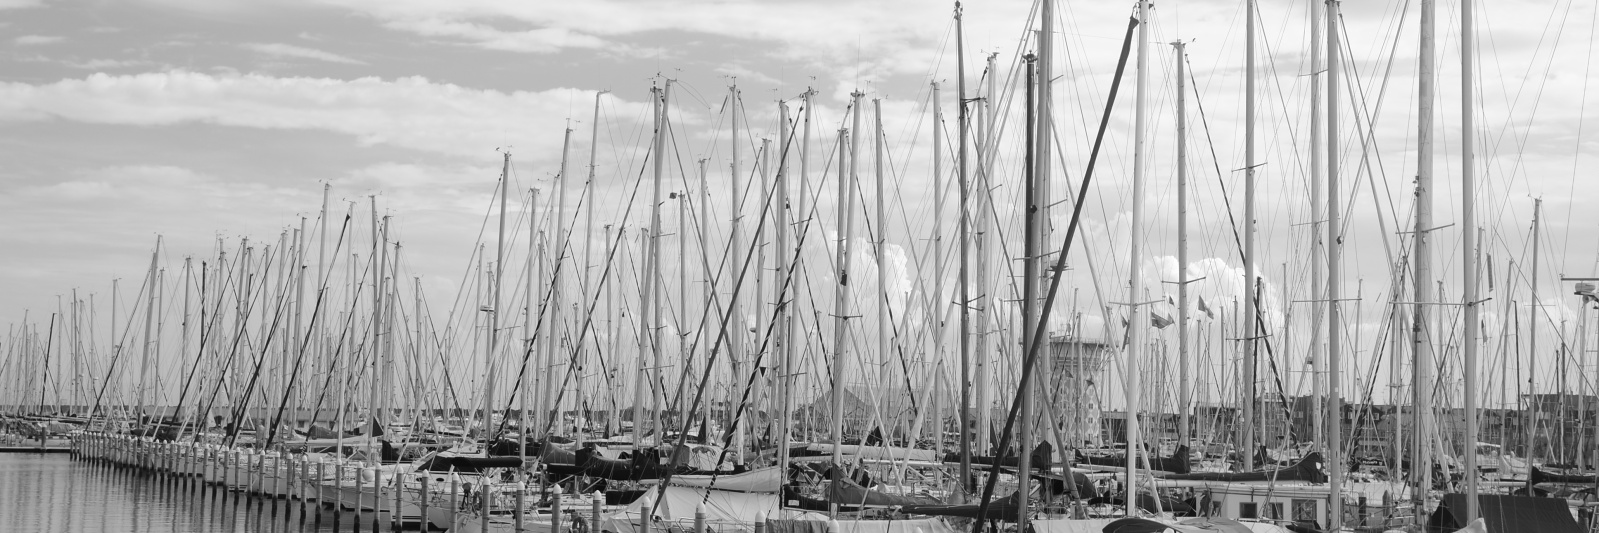 Marina di Ra - boats and seagulls